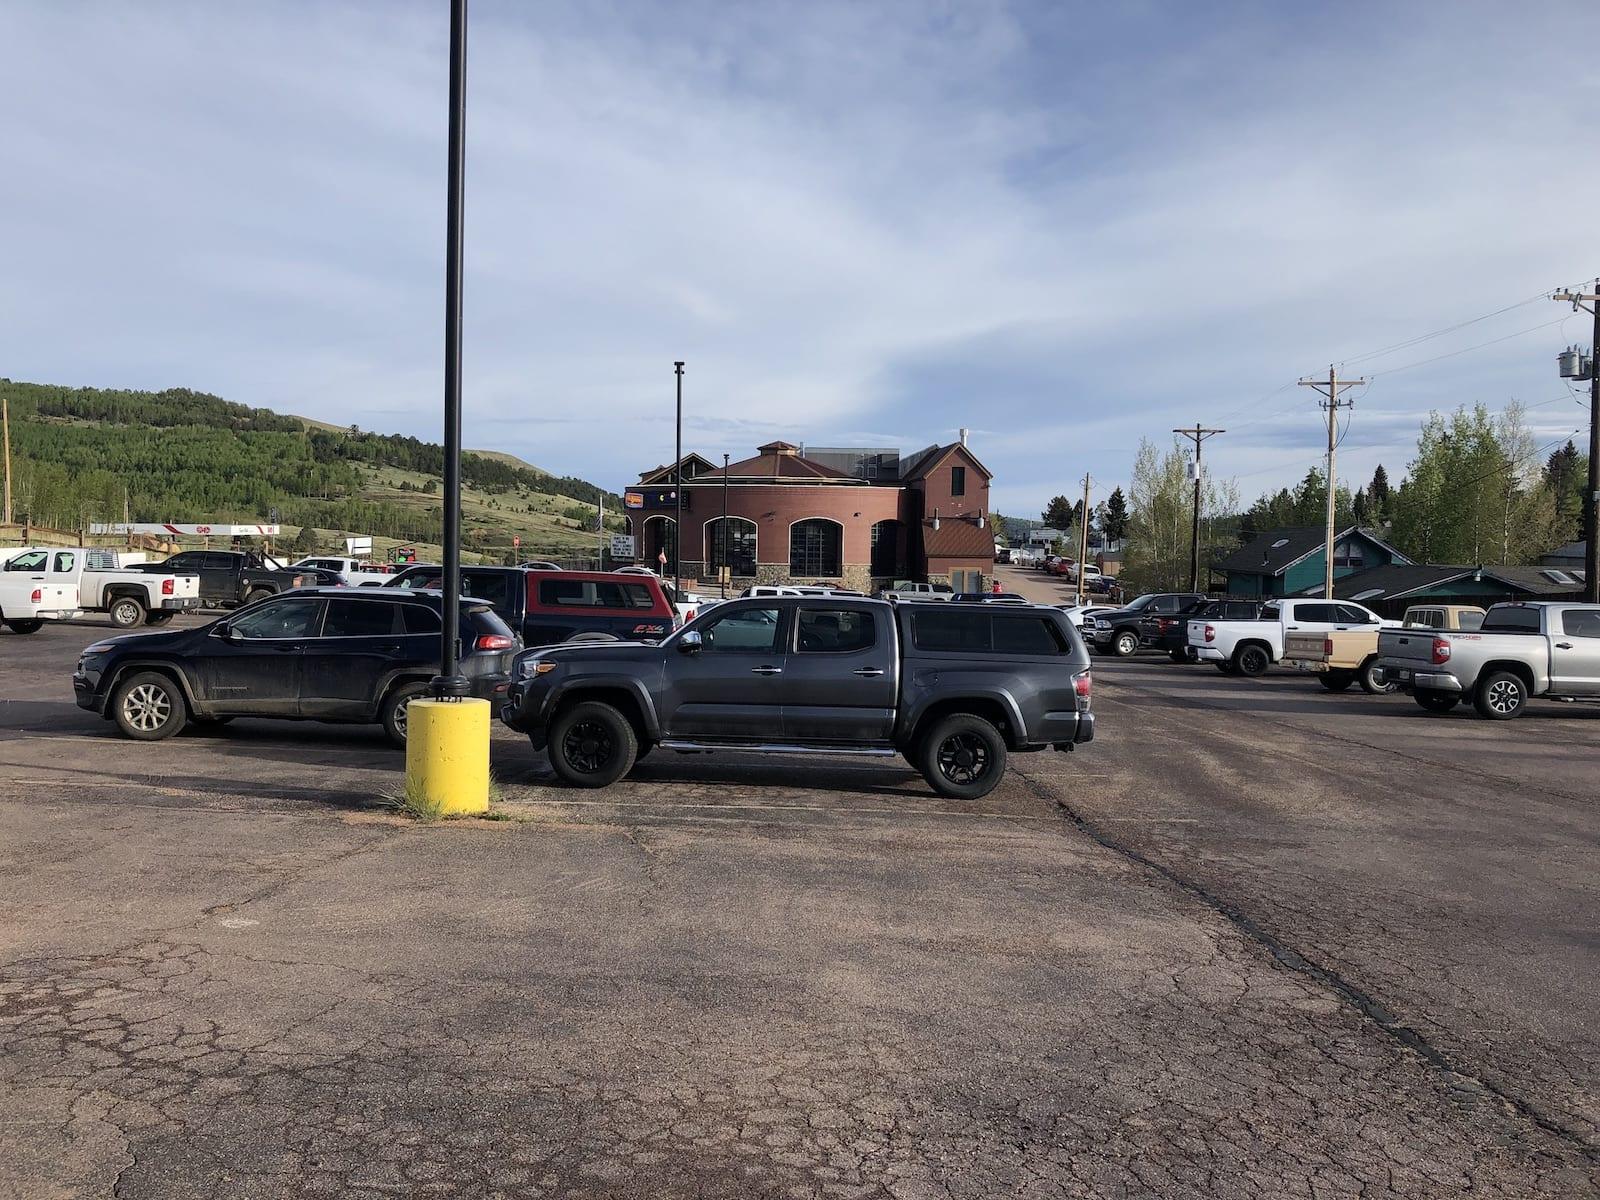 Wildwood Casino Cripple Creek CO Parking Lot